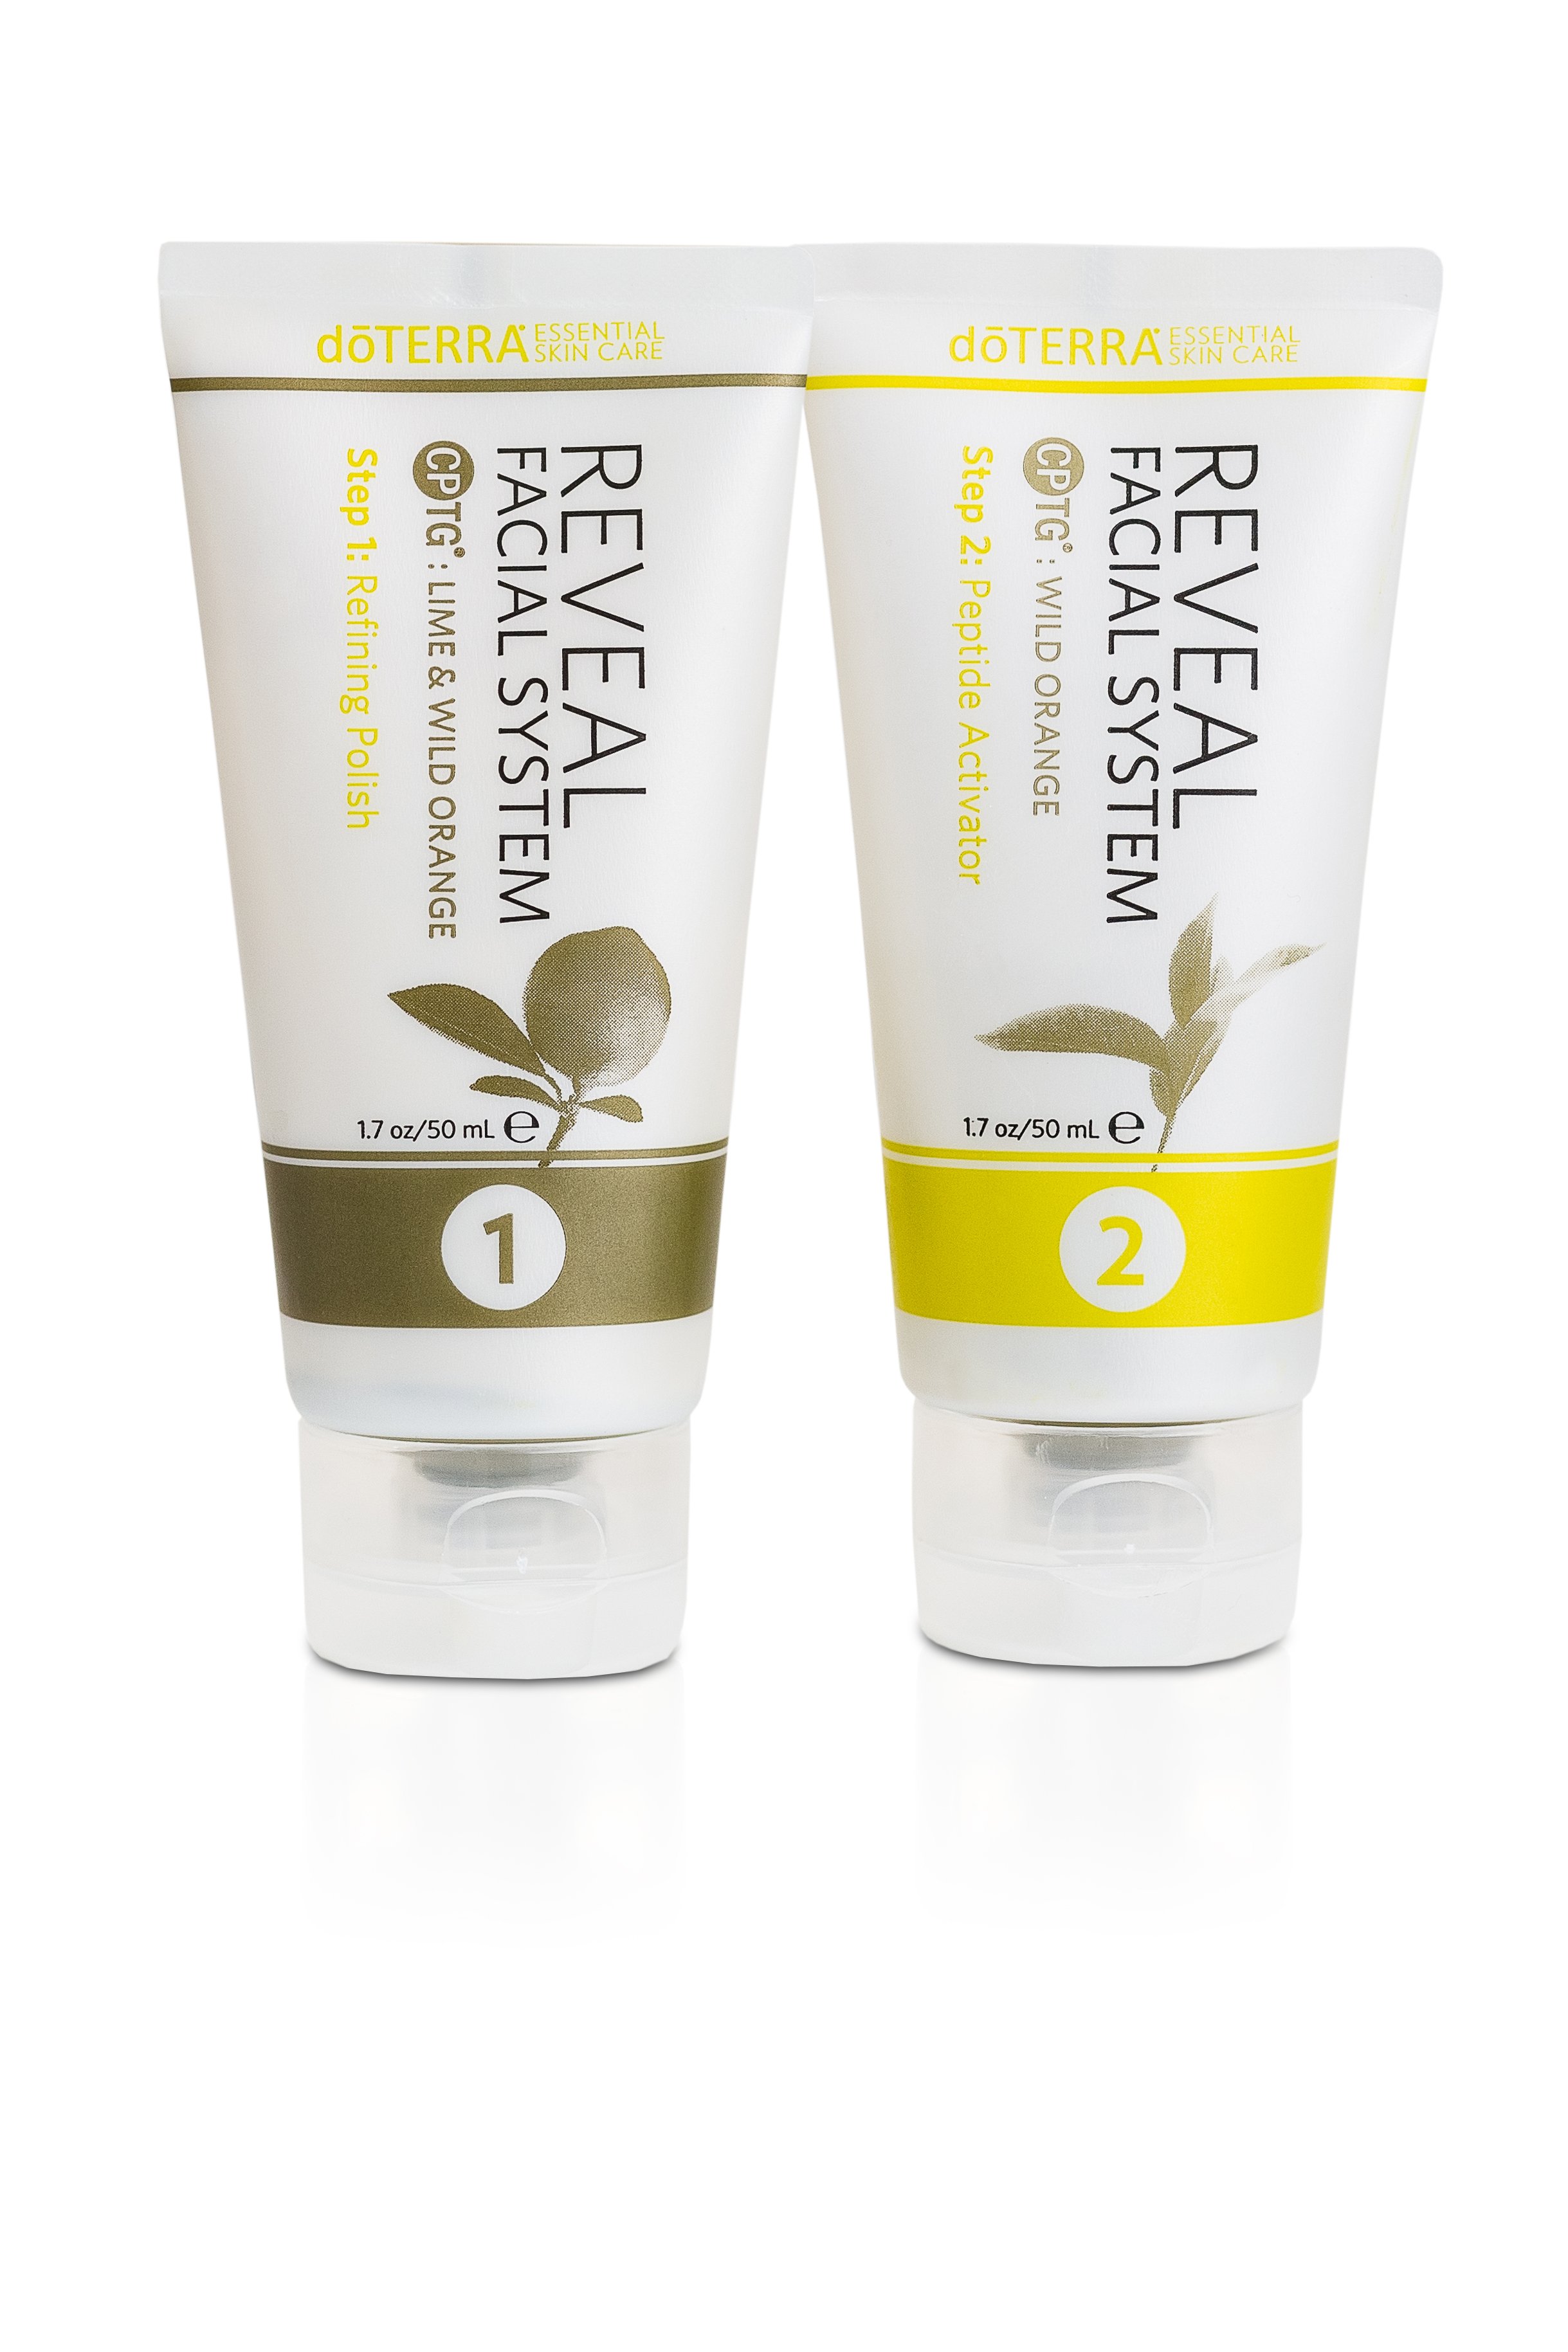 Skin Care High Resolution Images Dōterra Essential Oils